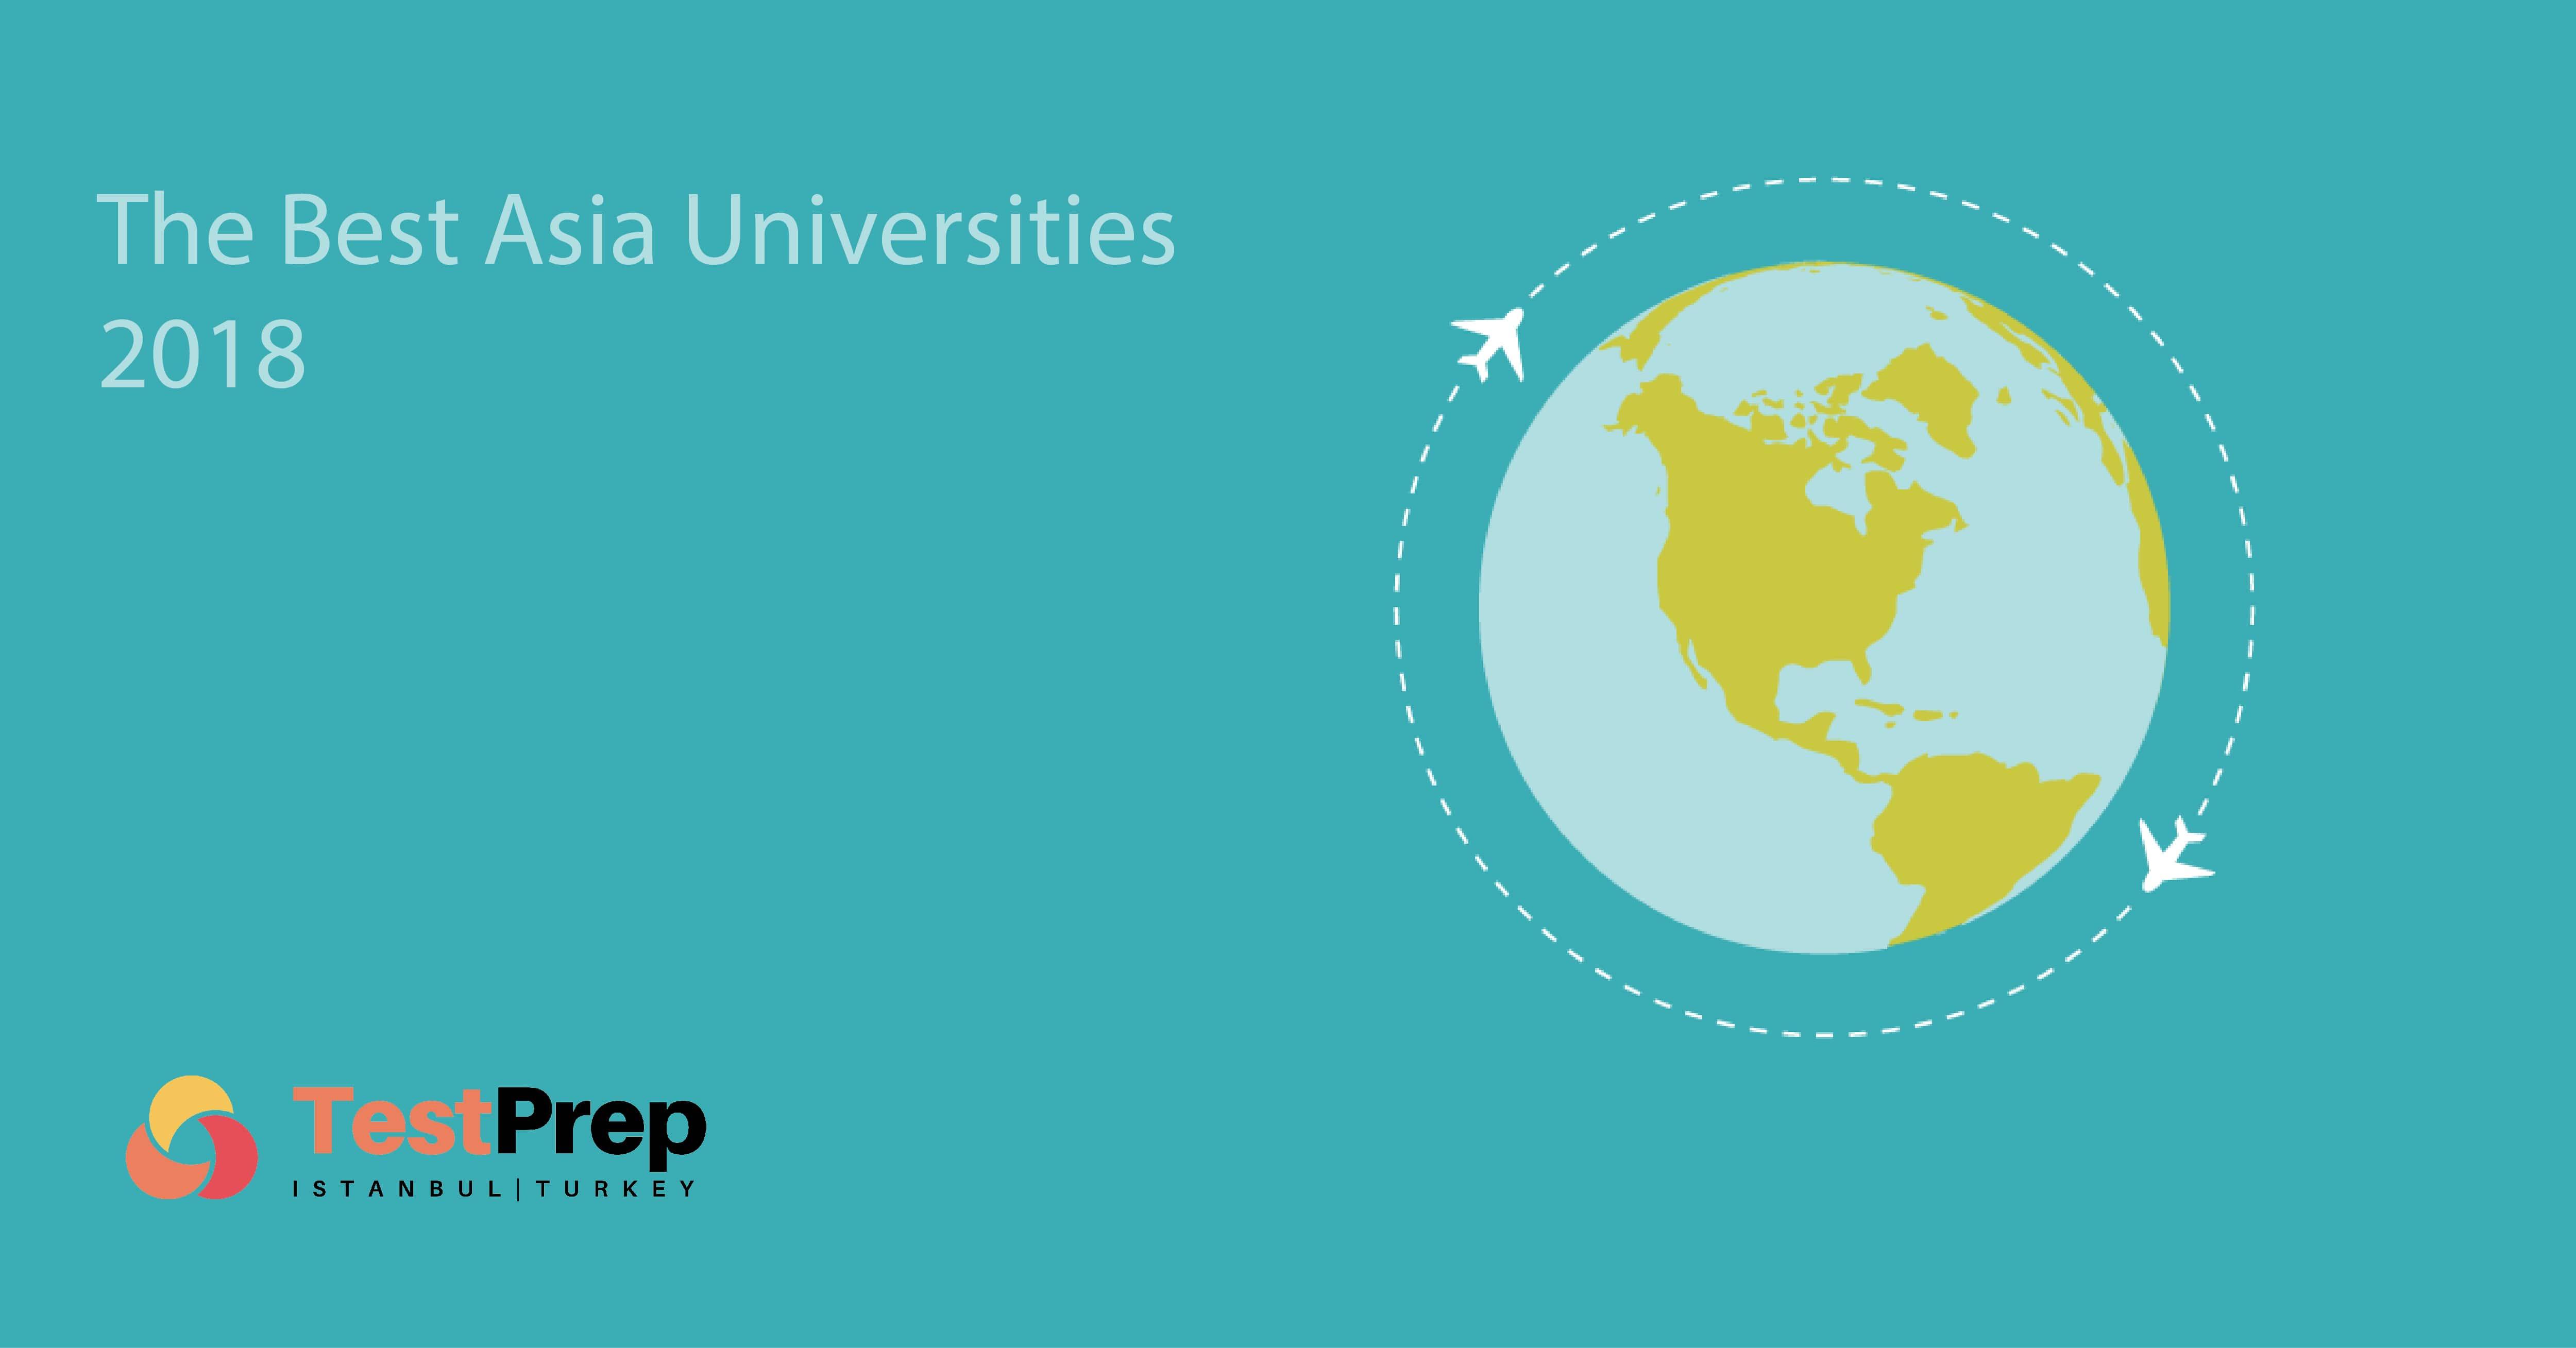 en iyi asya üniversiteleri 2018. asia university rankings 2018.